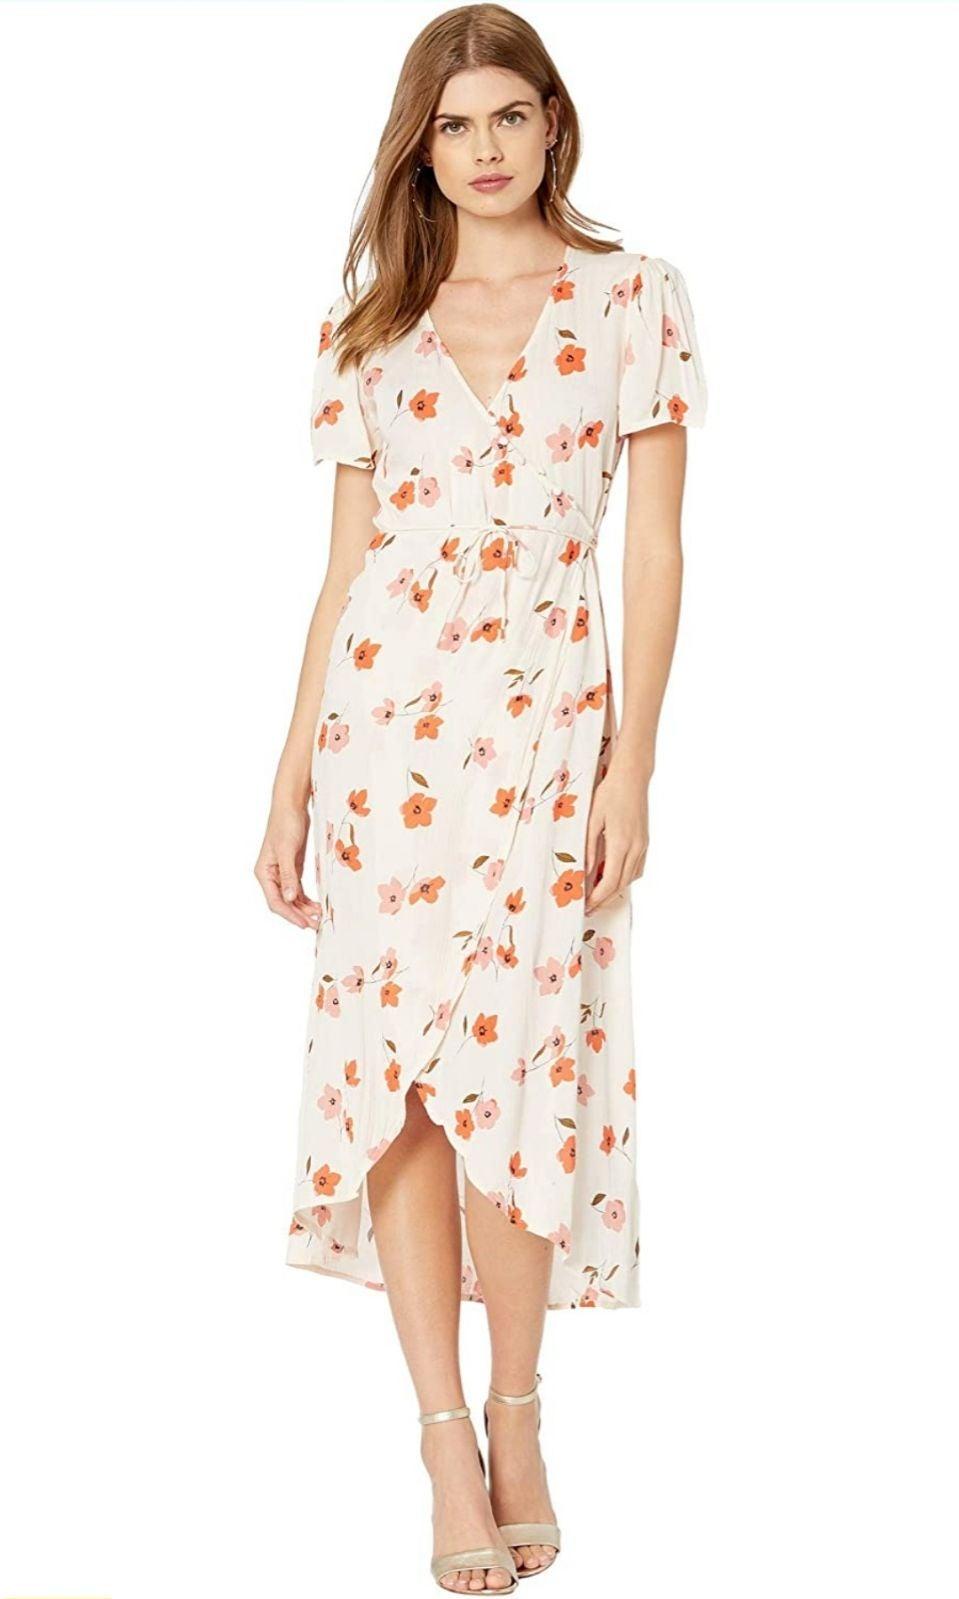 Billabong floral wrap dress MSRP $70